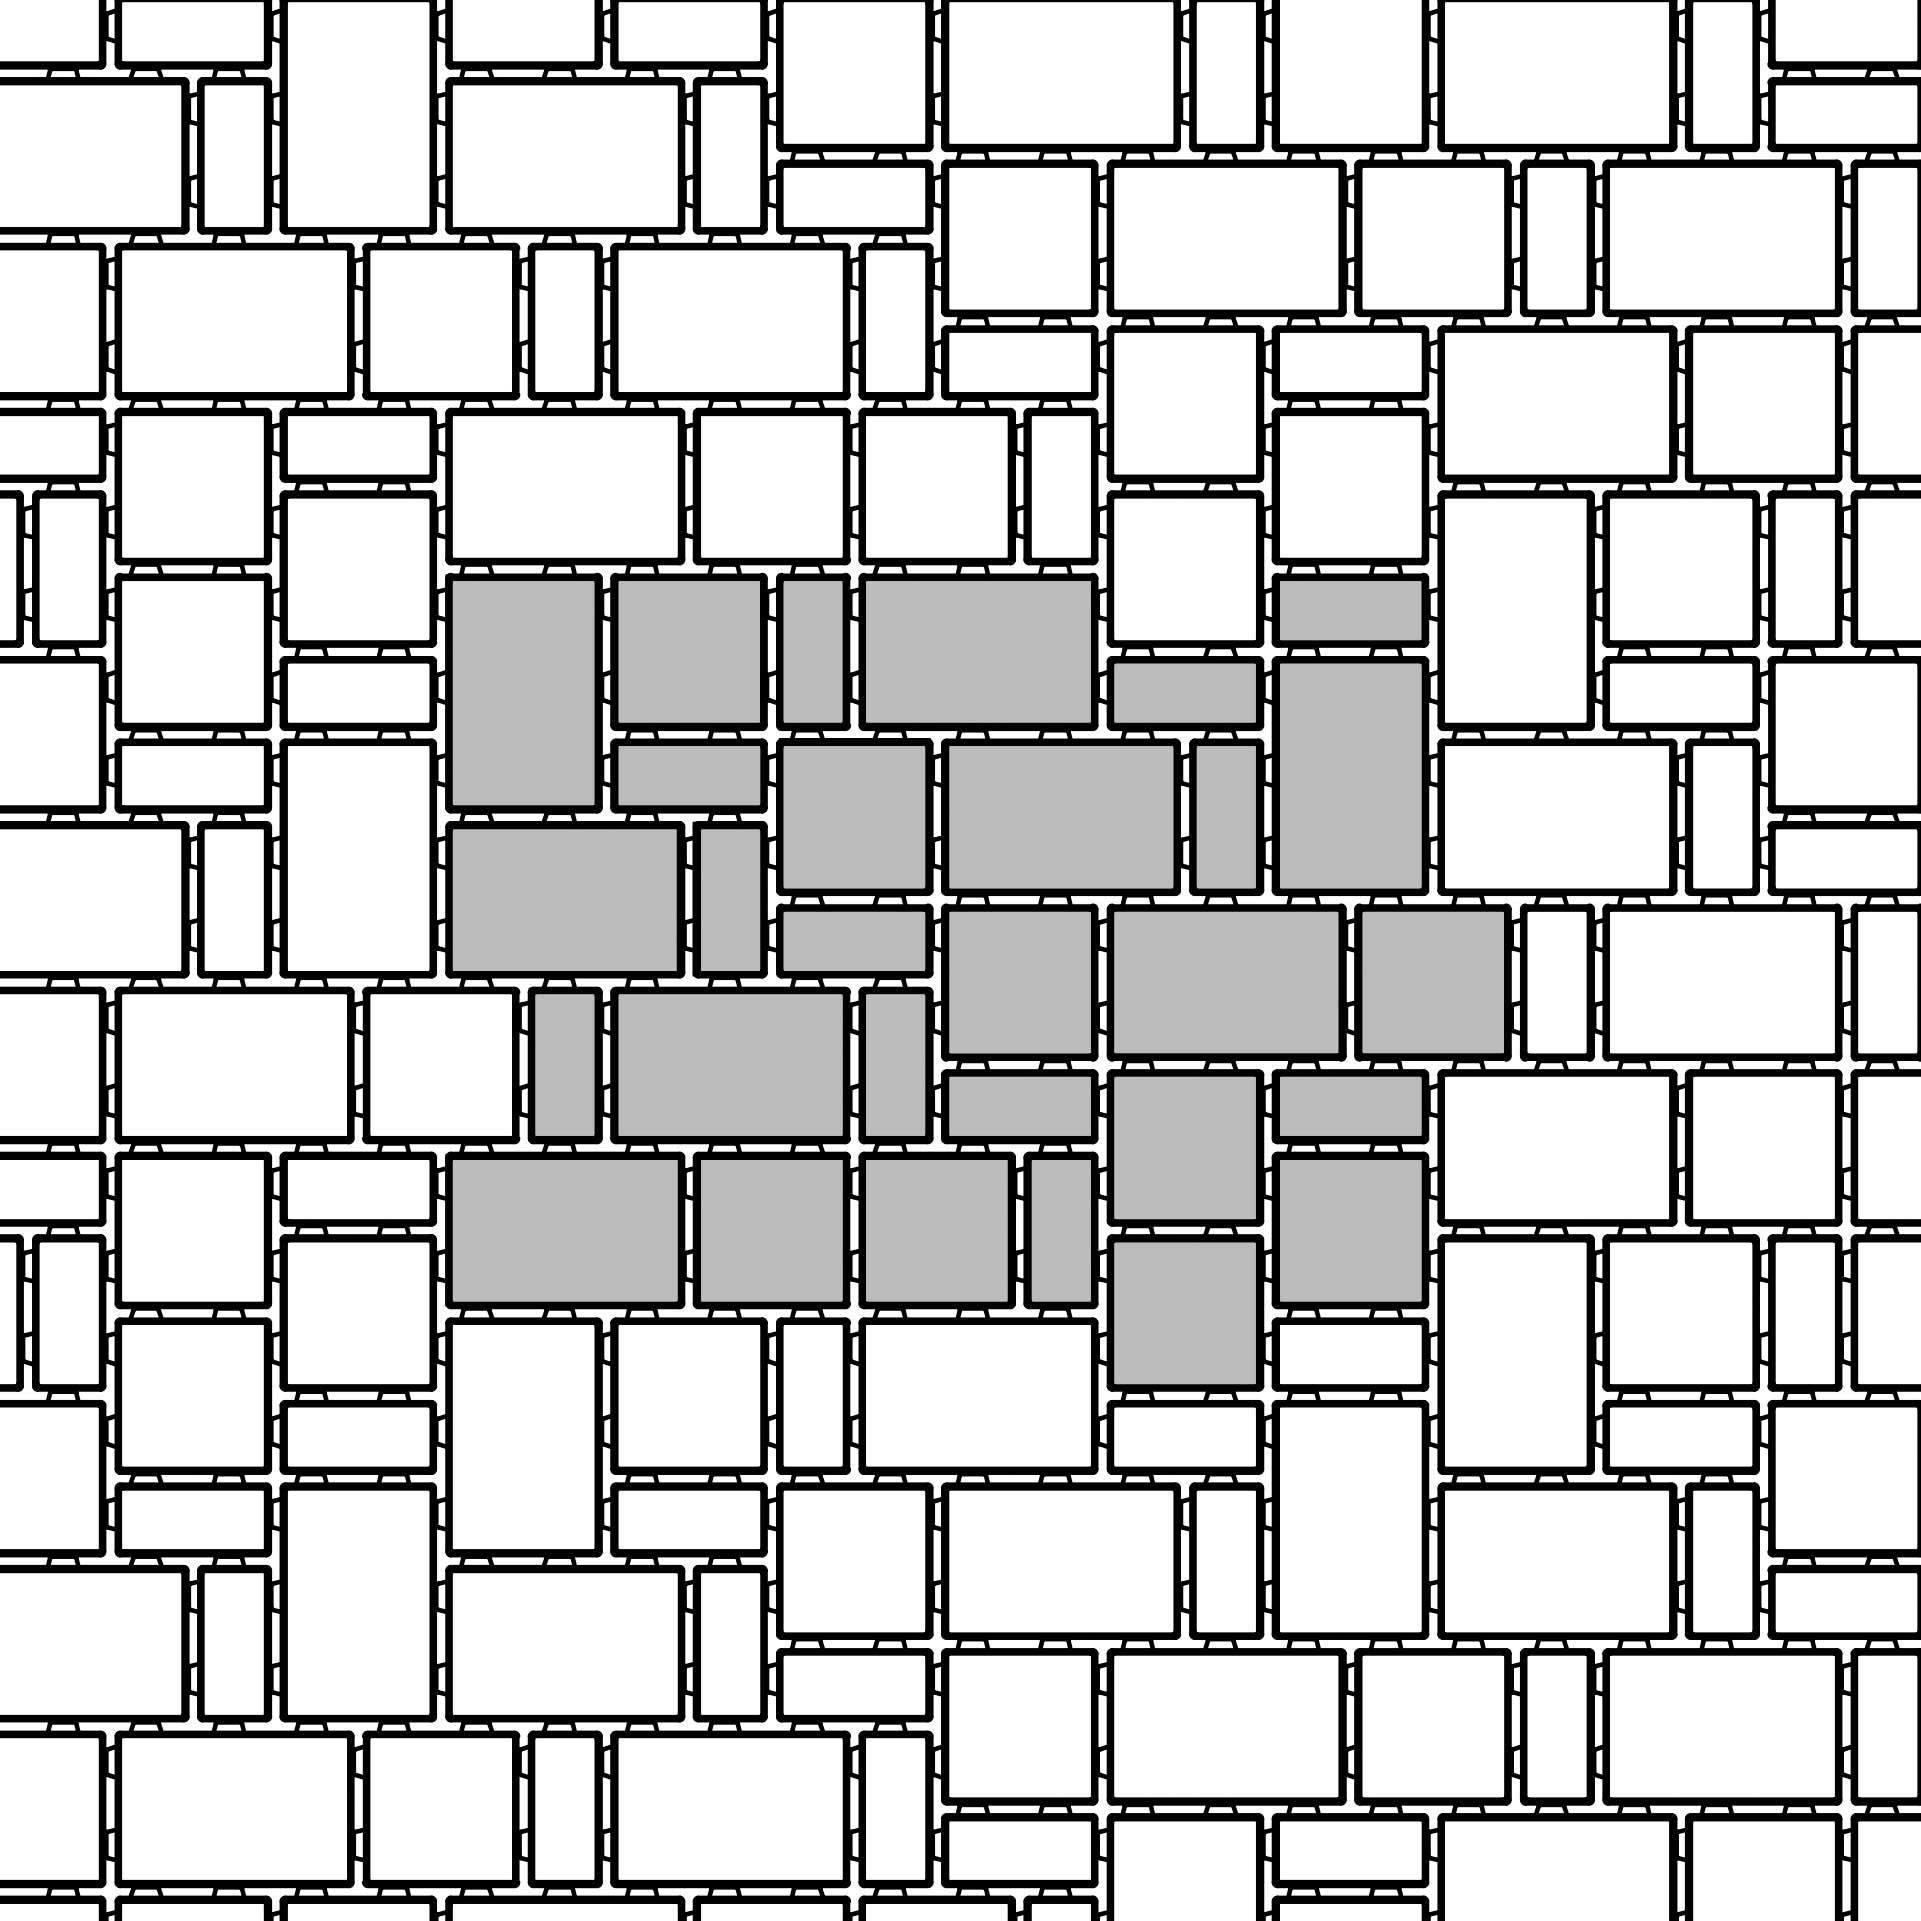 harmony permeable pavers. Black Bedroom Furniture Sets. Home Design Ideas